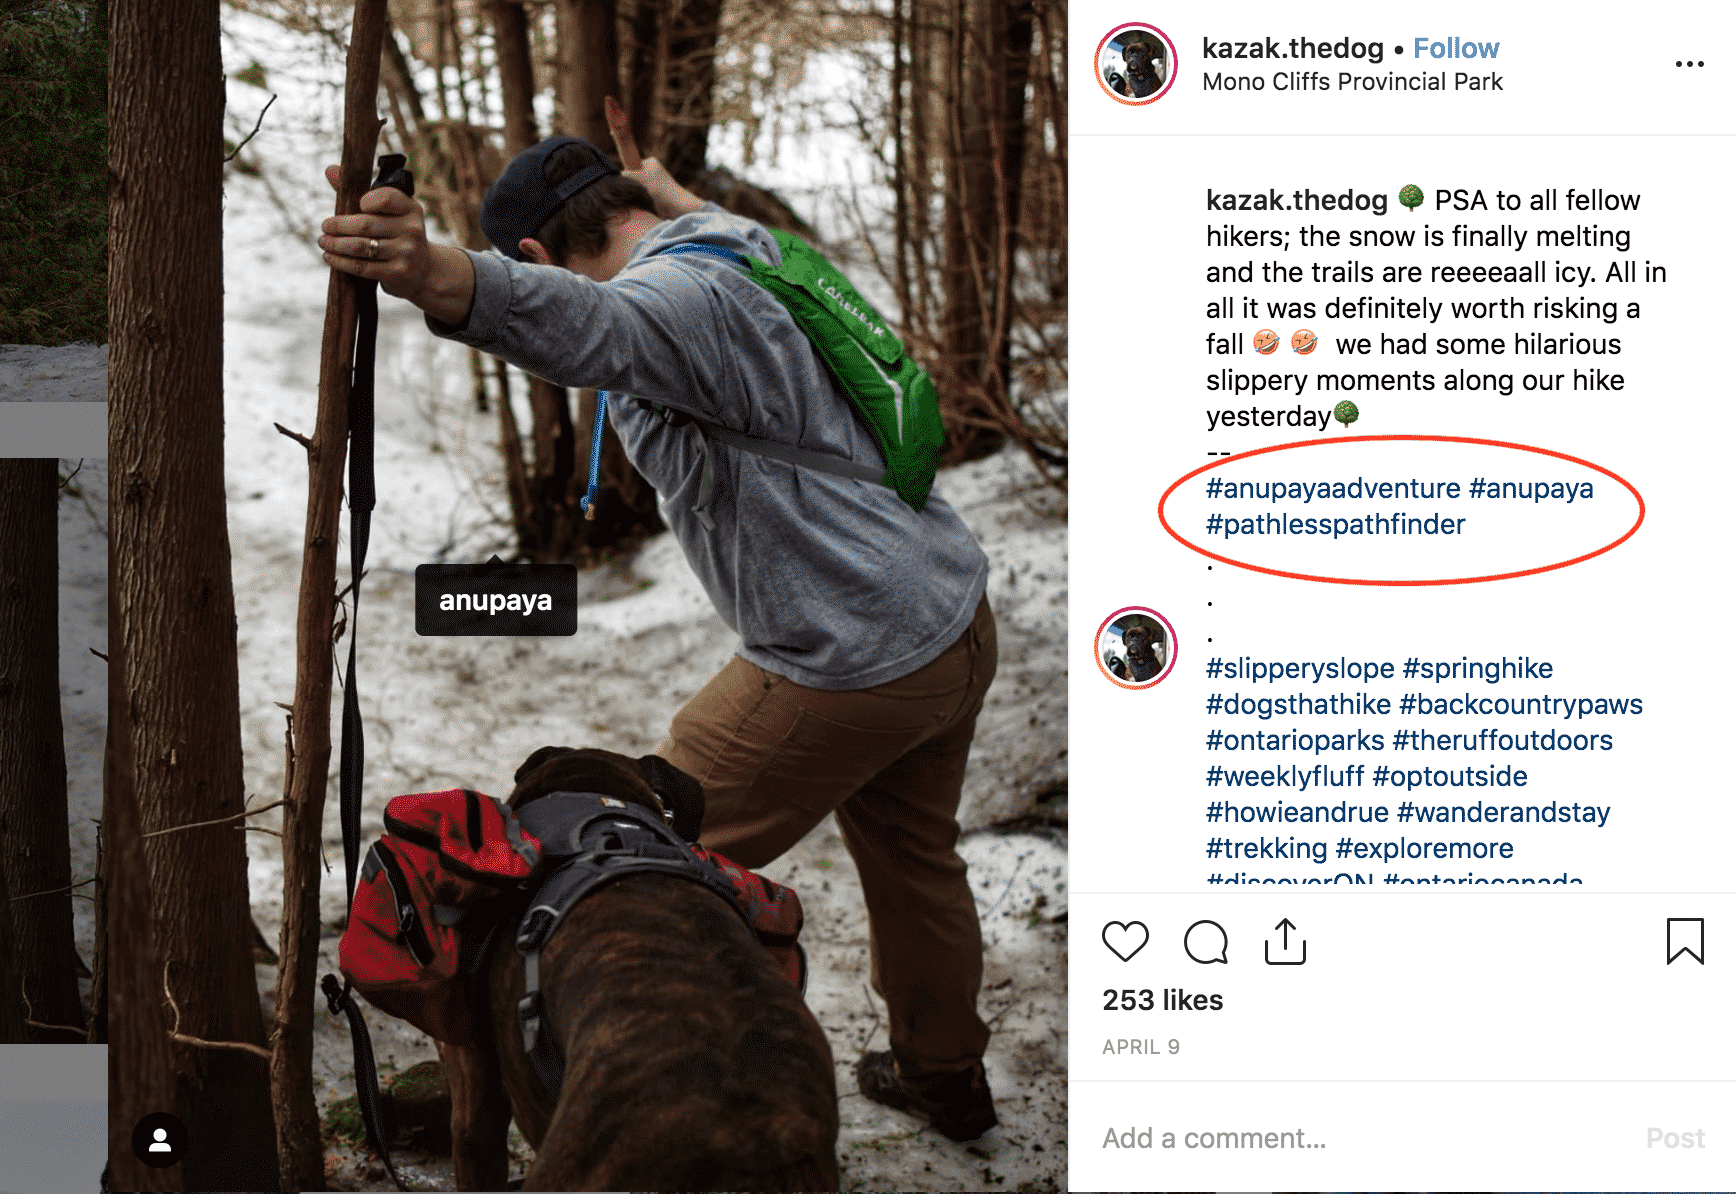 Anupaya ambassador pathfinder instagram post hiking backpack dog with backpack trees